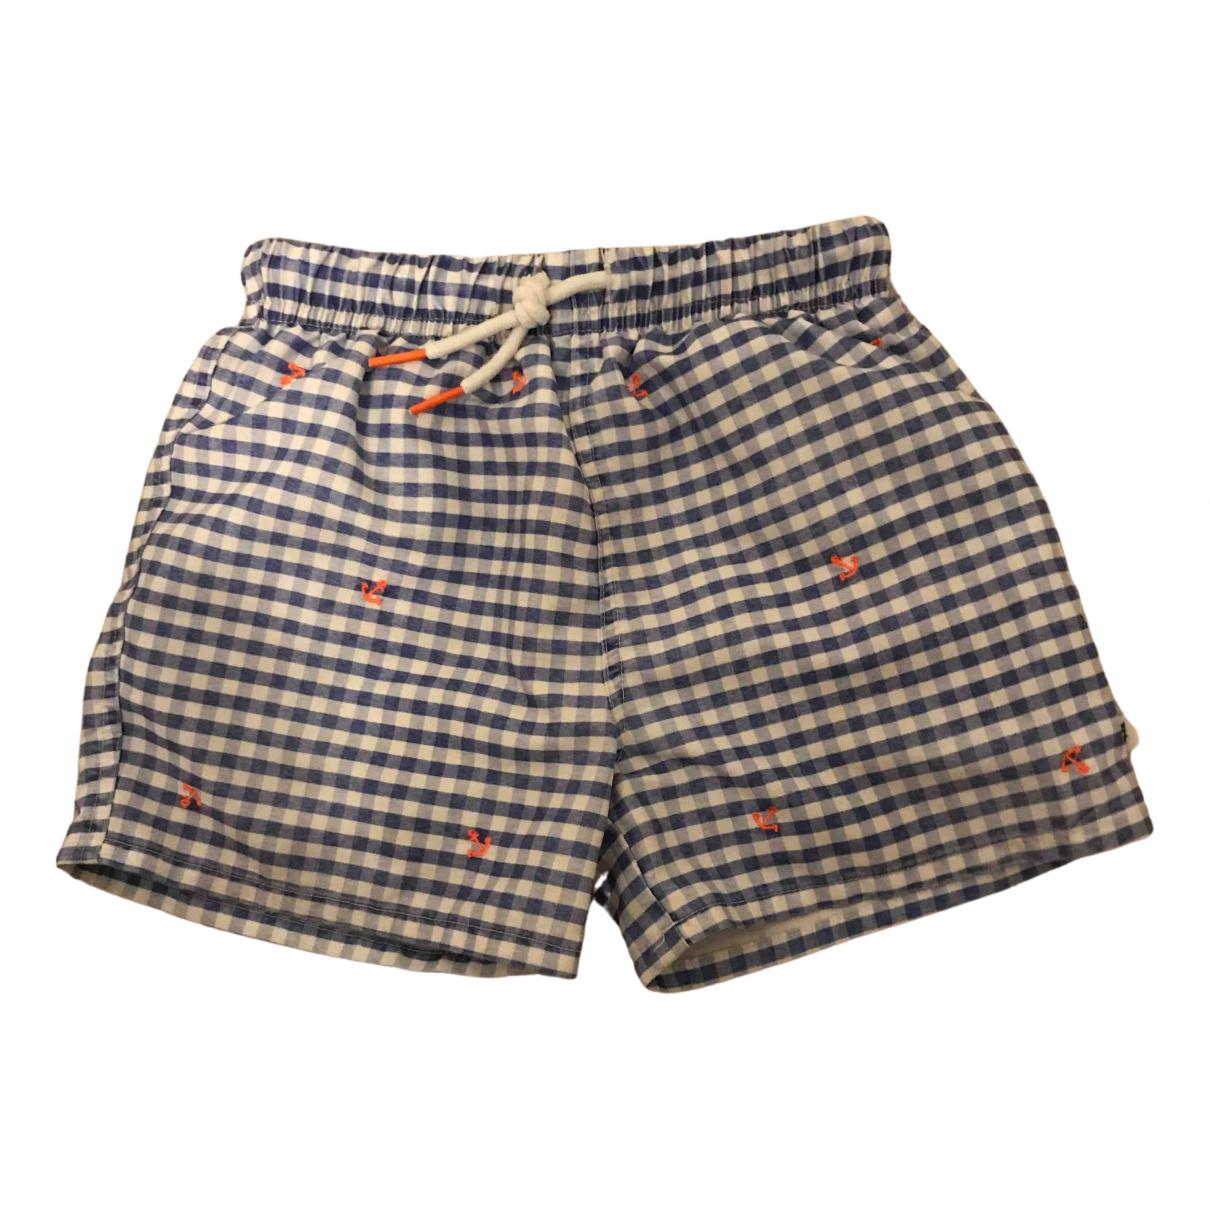 Jacadi \N Shorts in  Blau Polyester